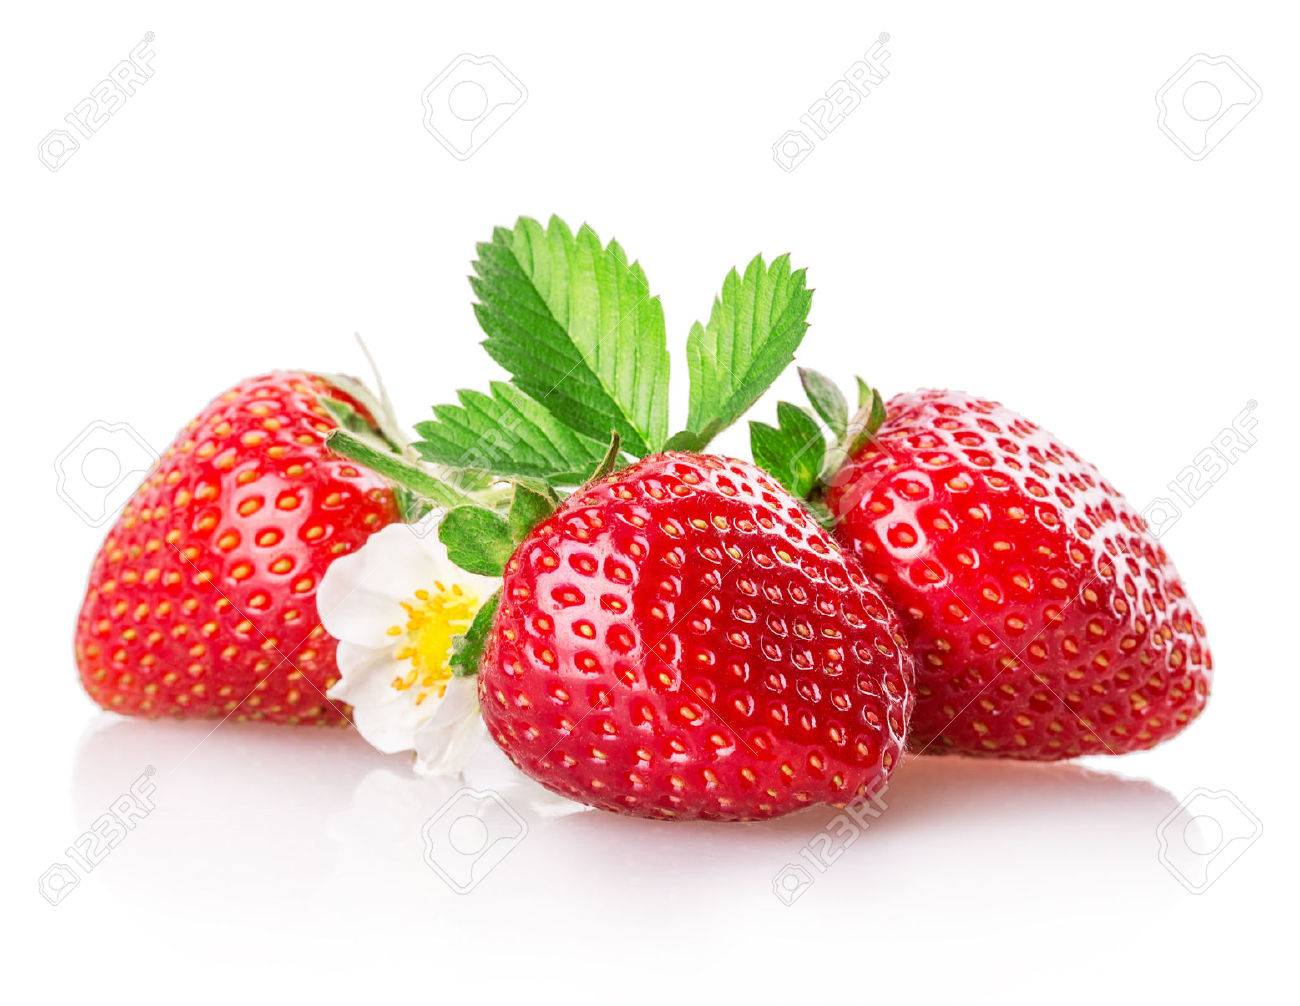 strawberry Isolated on white background Standard-Bild - 41836555